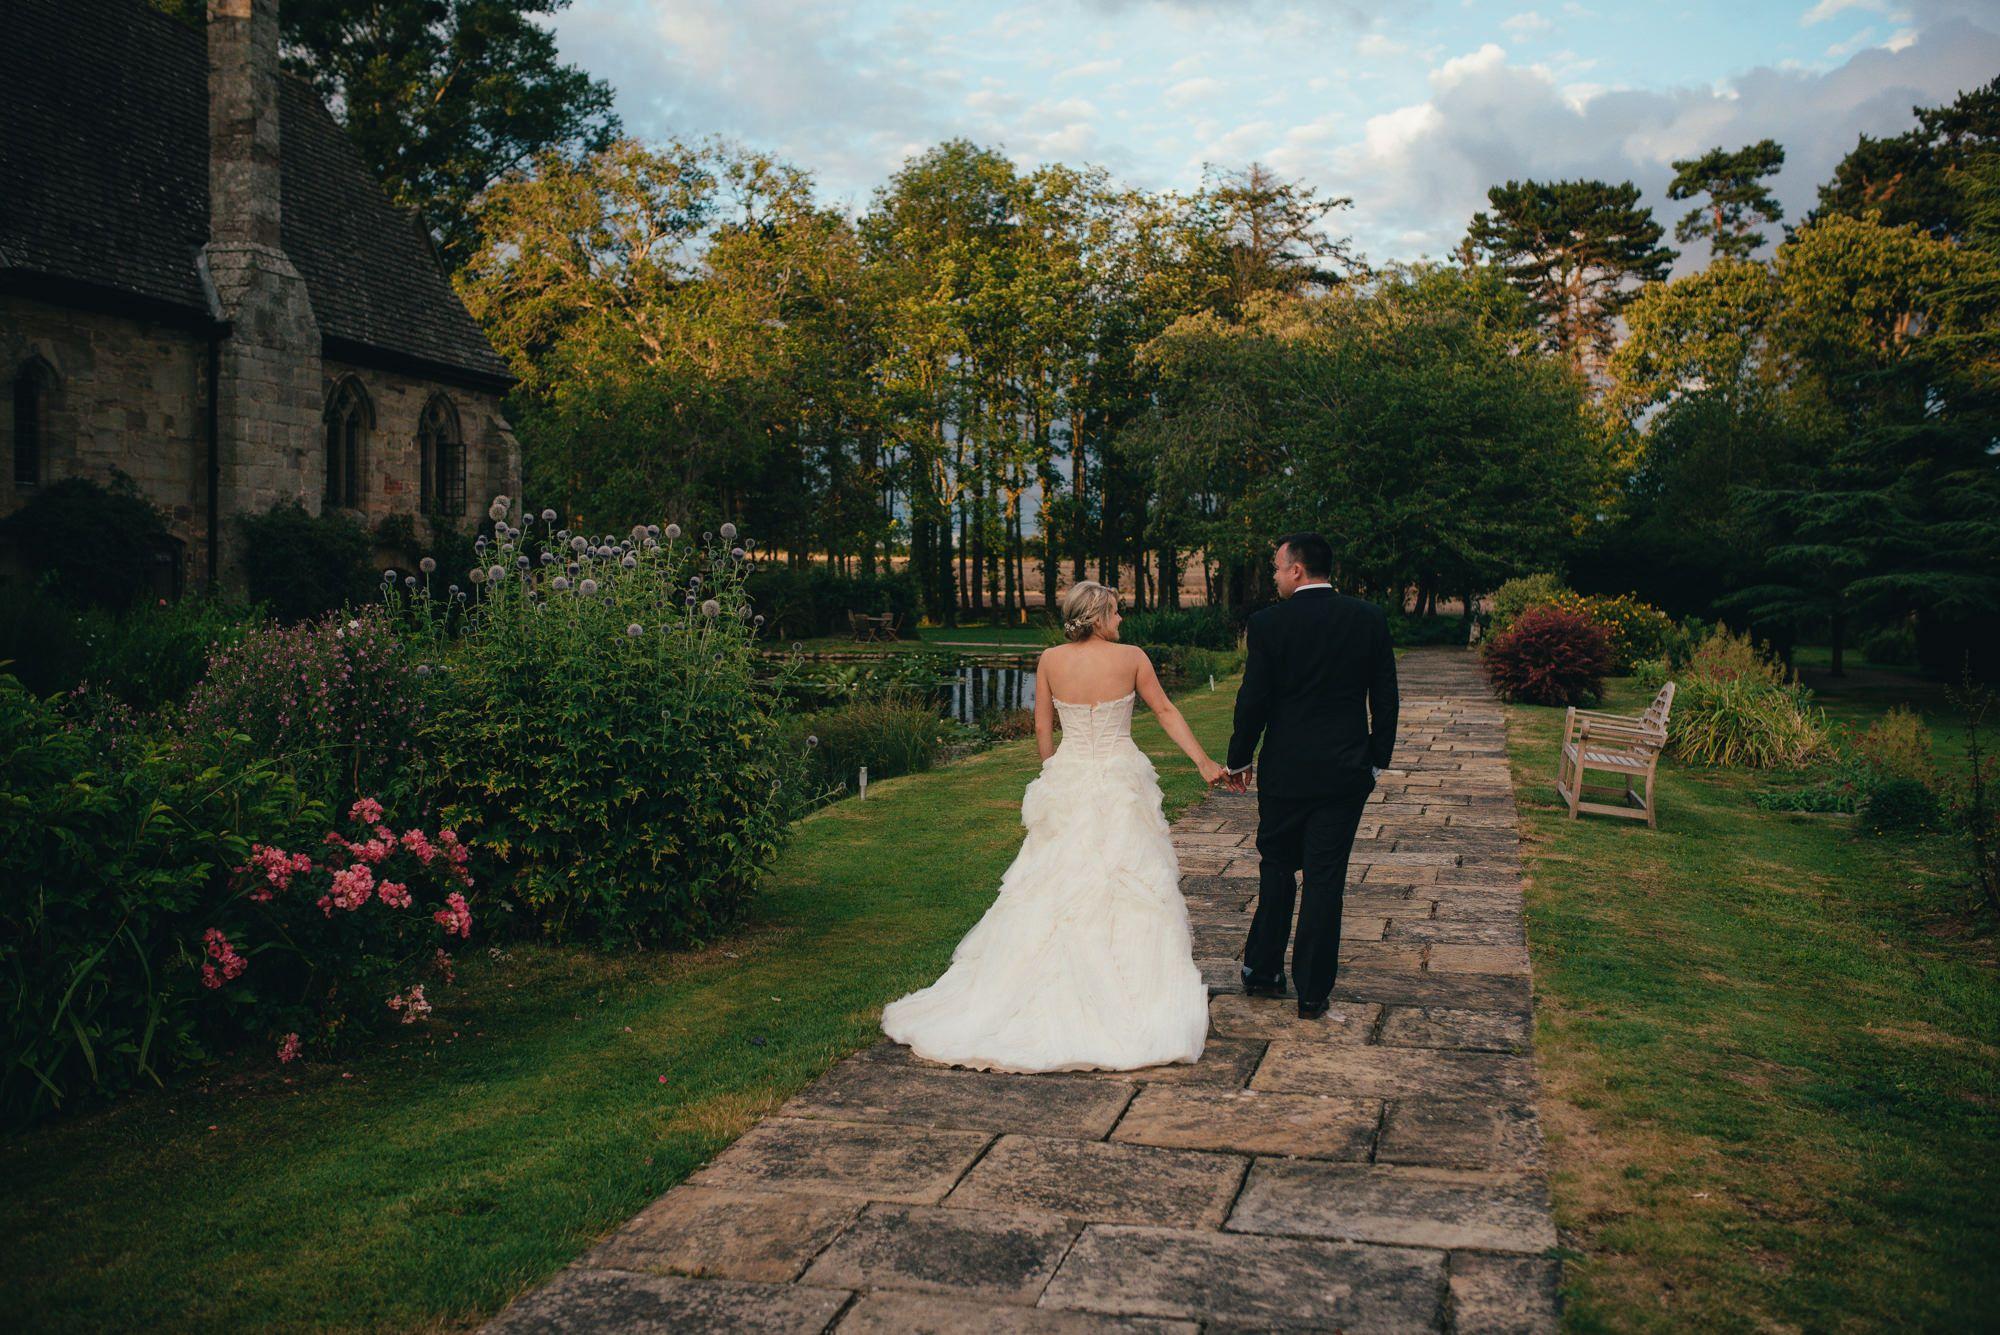 Brinsop Court Wedding Photography90 Wedding Court Wedding Wedding Photographers